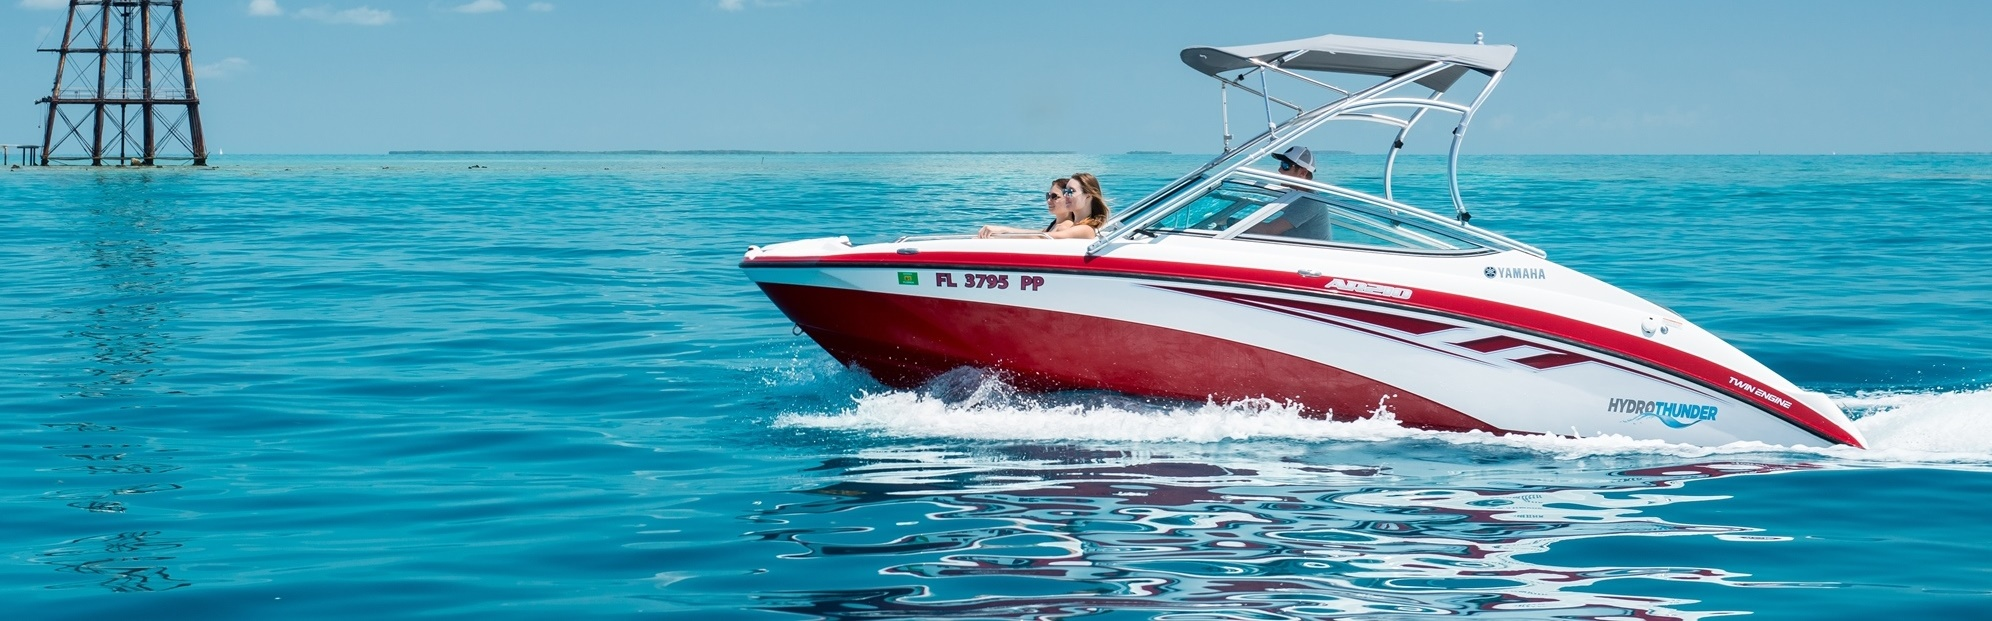 Hydrothunder-hp32